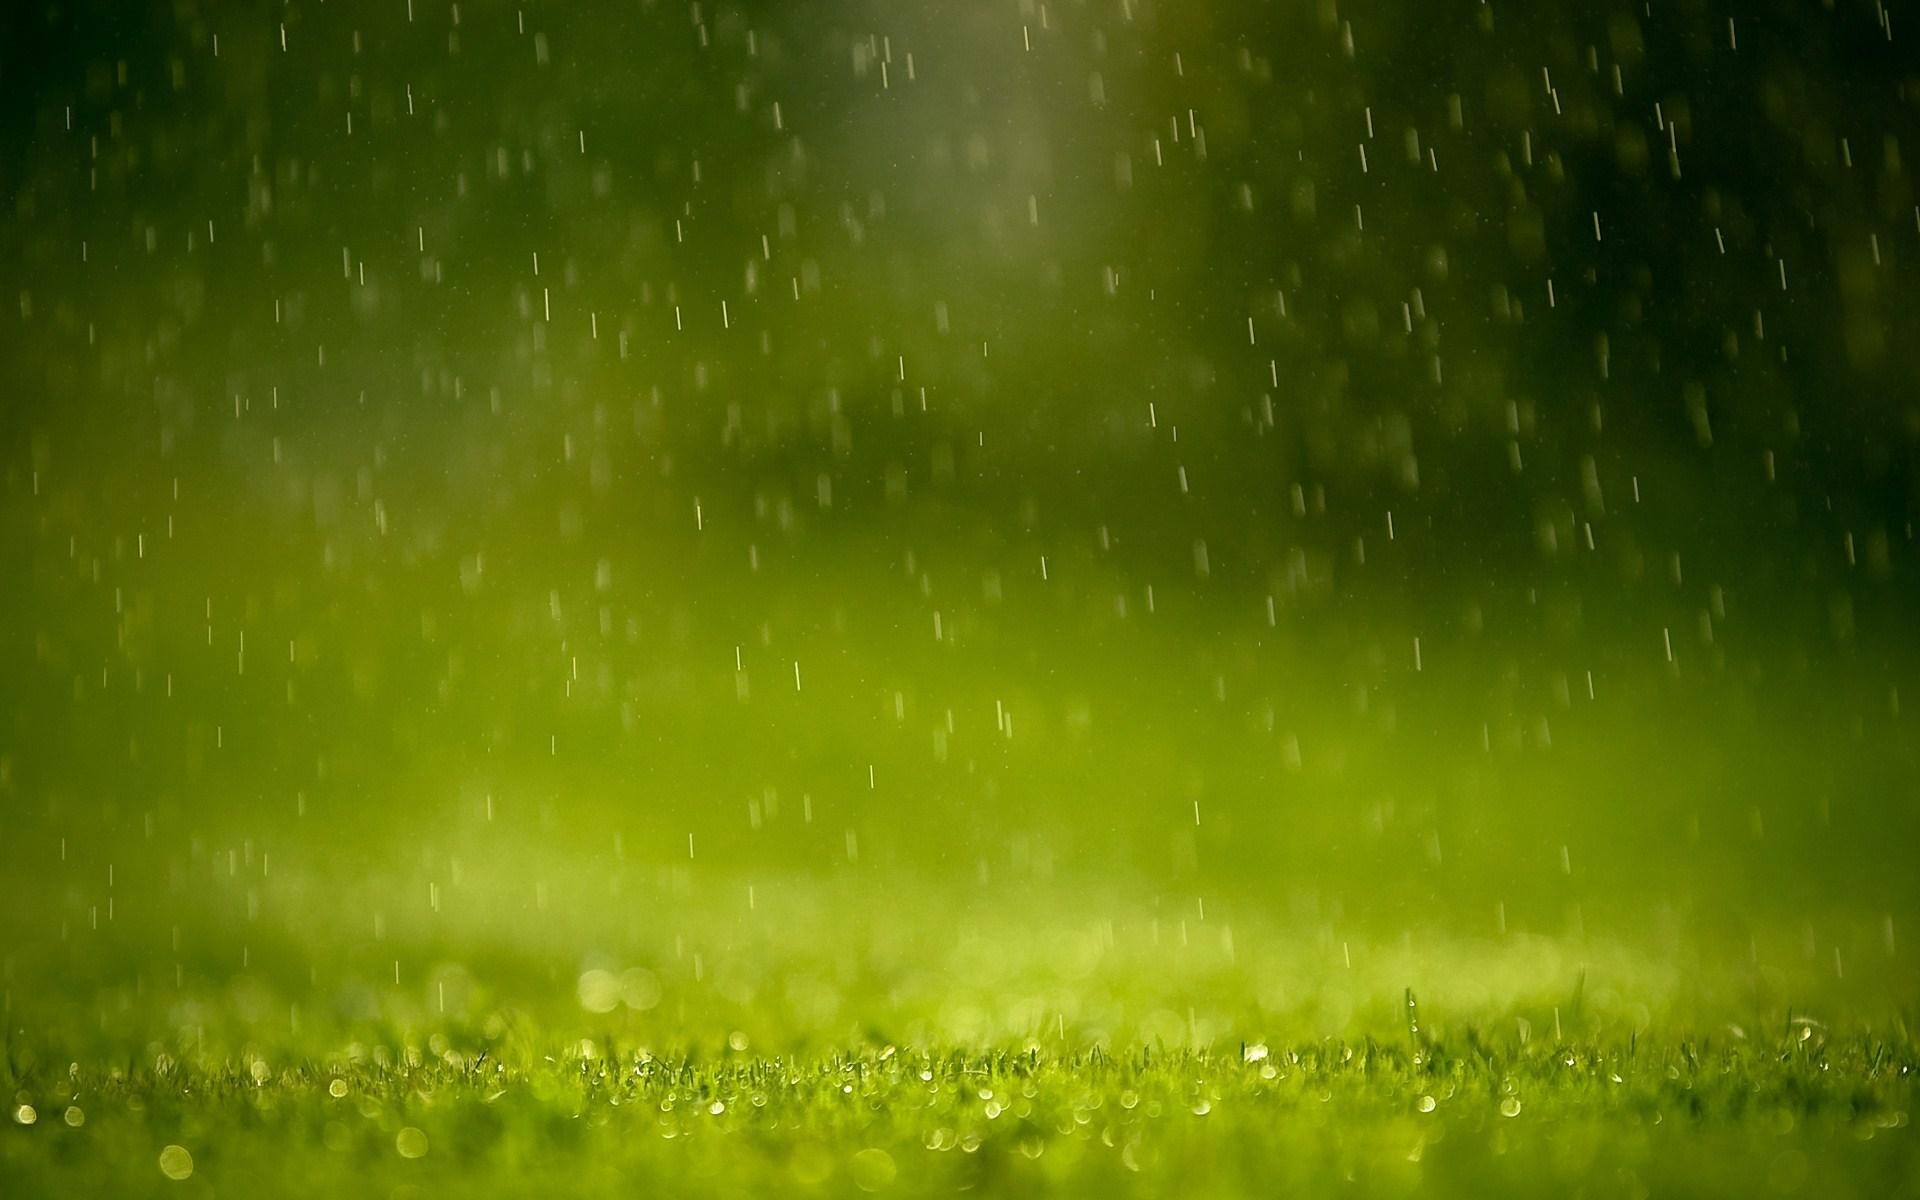 Grass Rain Drops Nature